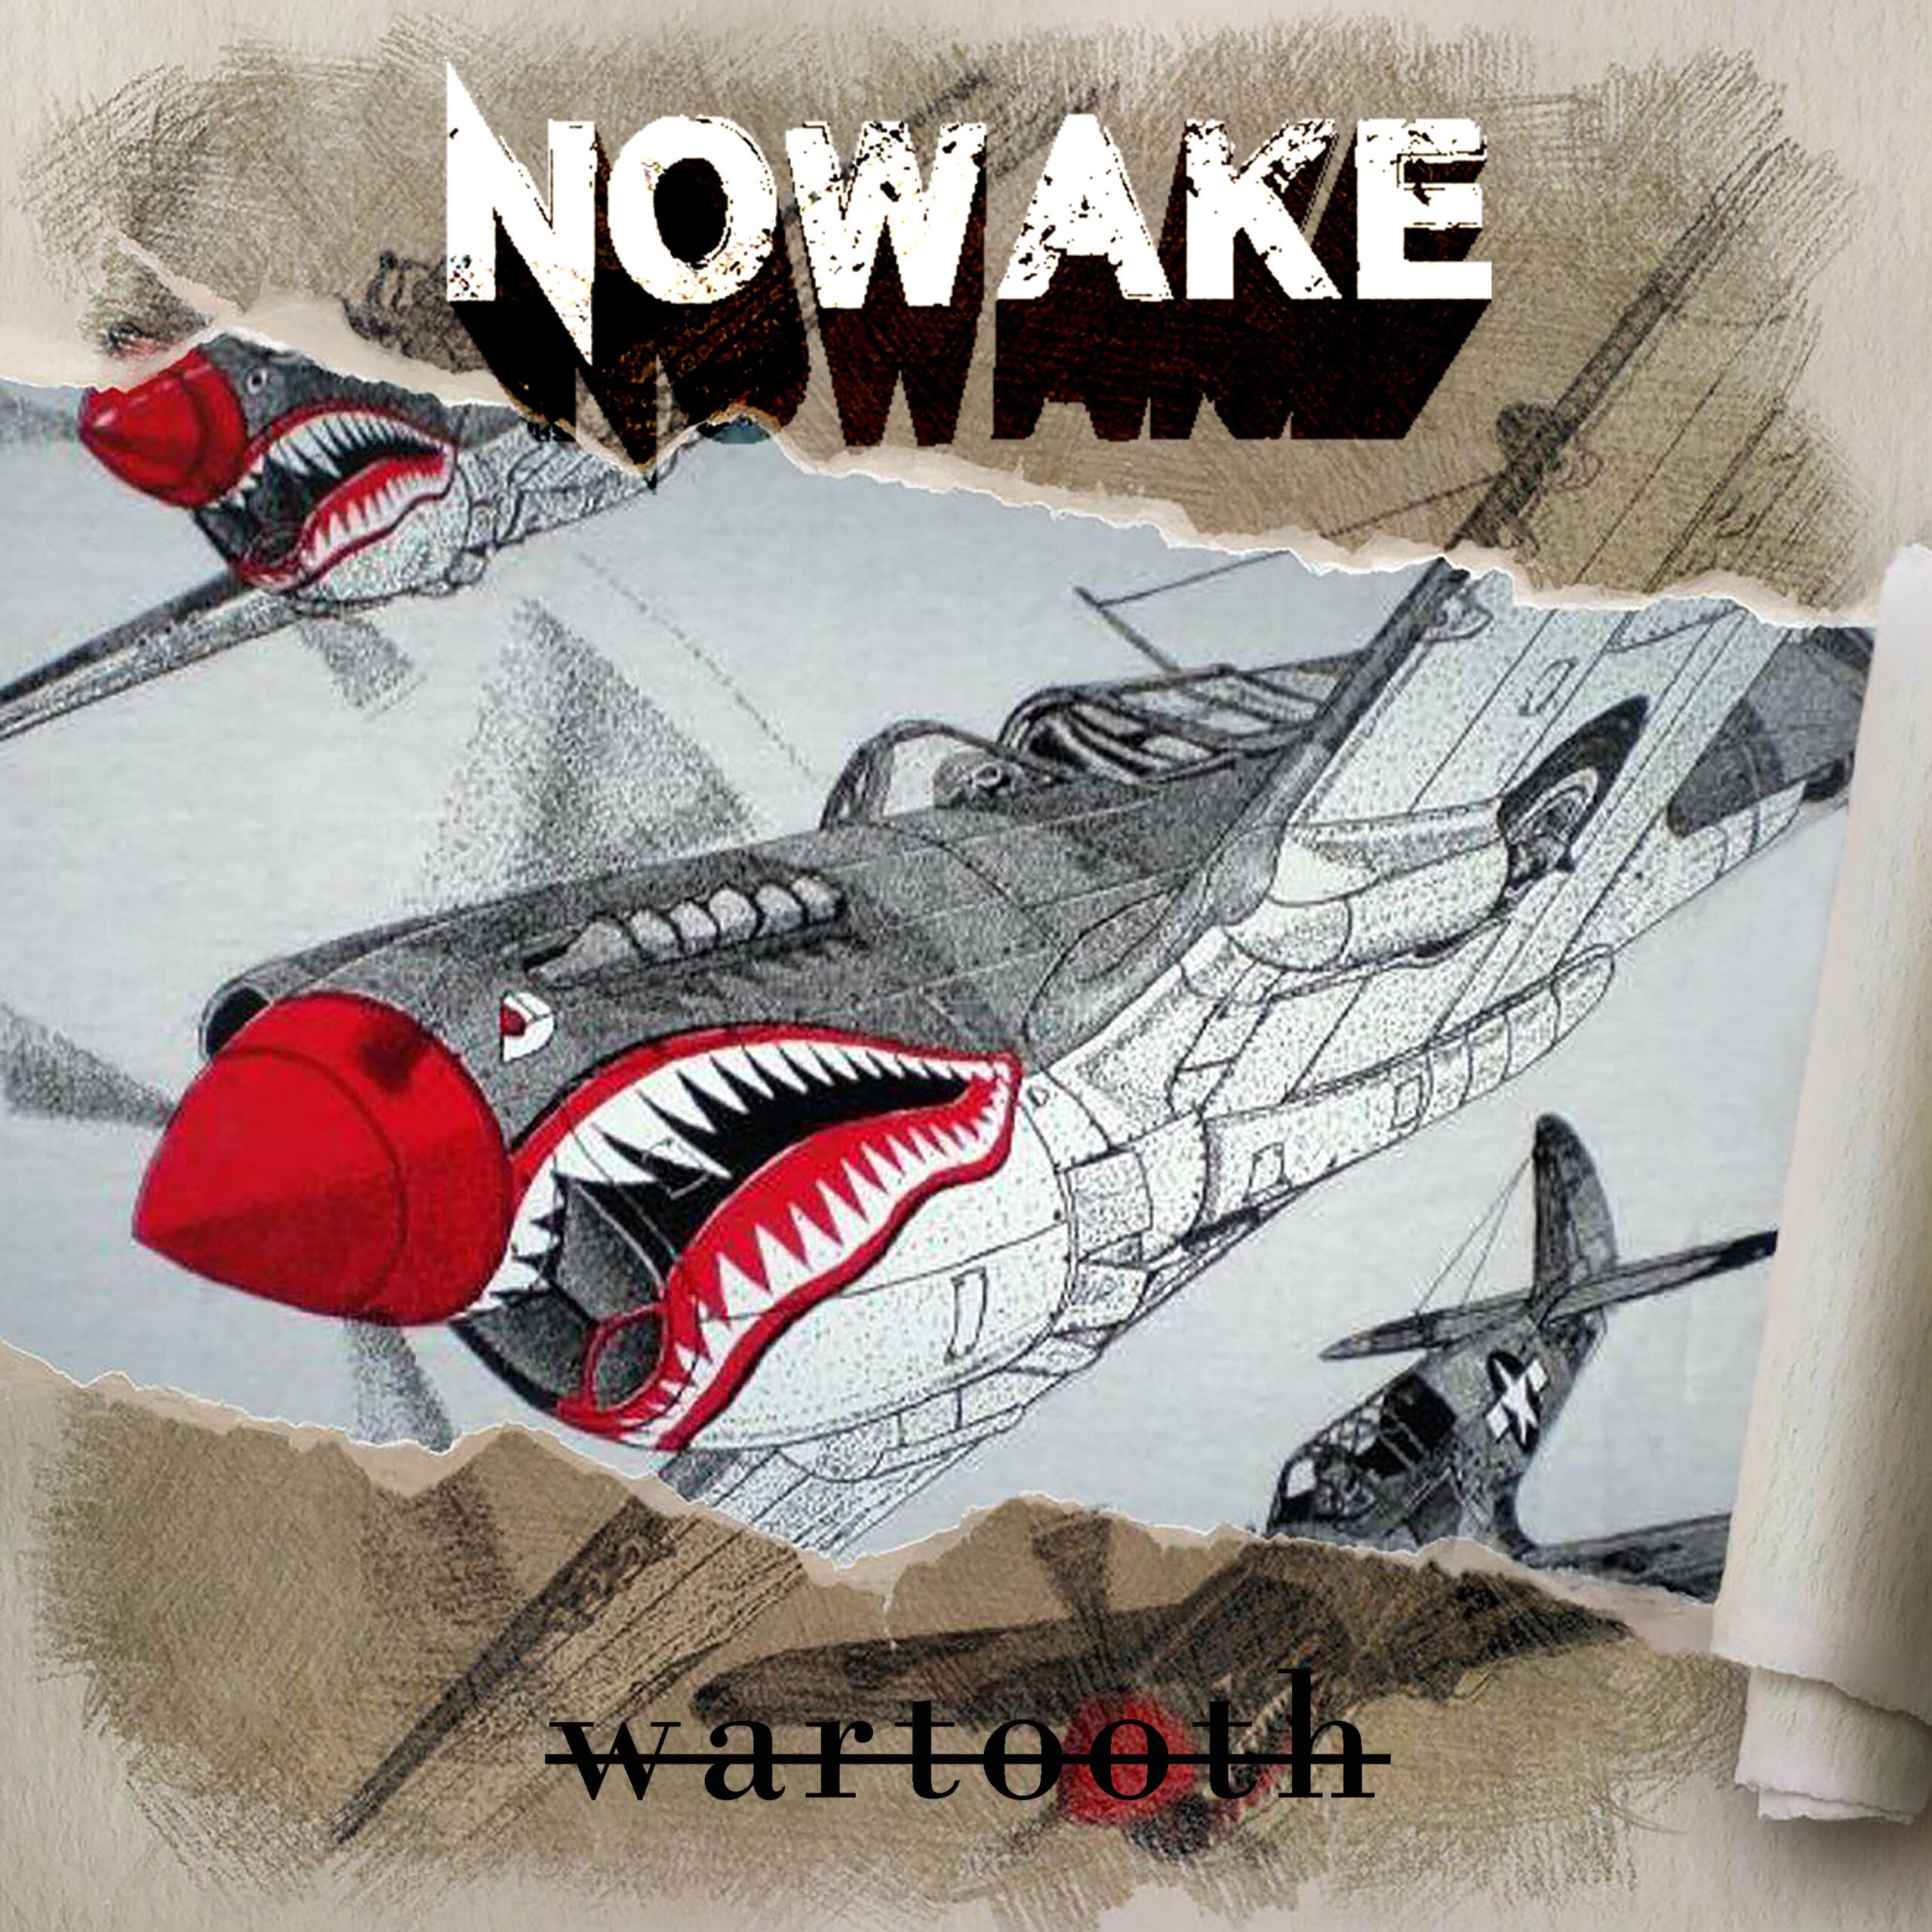 Hannibal's NOWAKE drop new EP